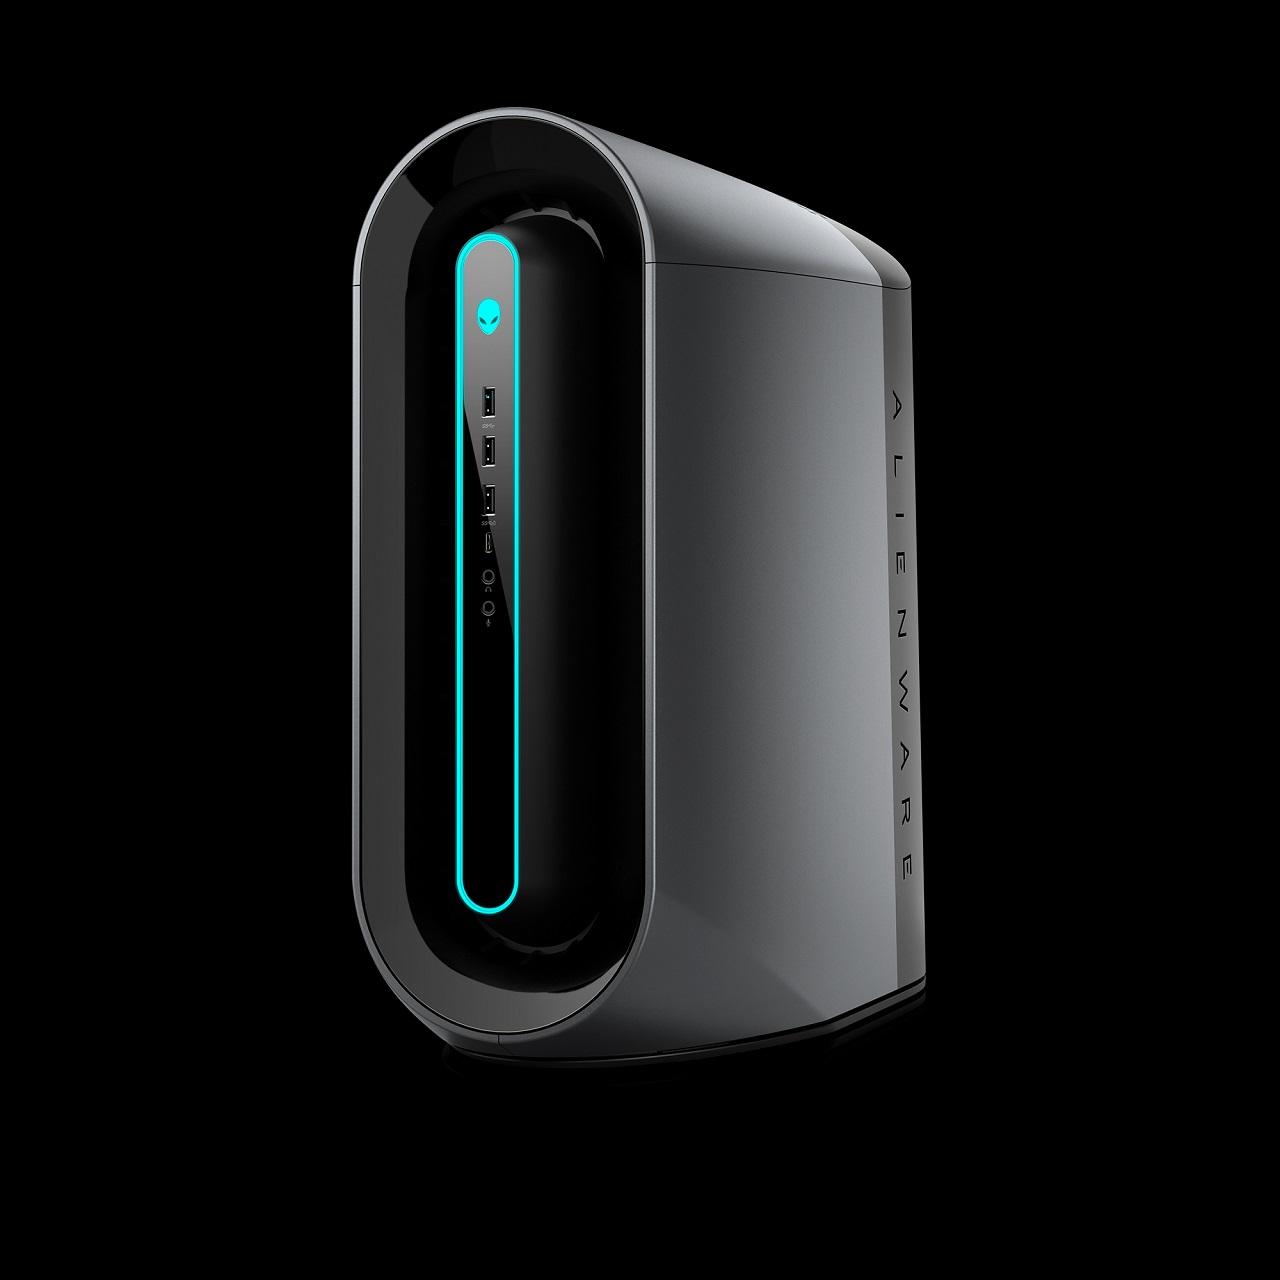 Dell has unveiled the Alienware Aurora R9 desktop at Gamescom 2019 3